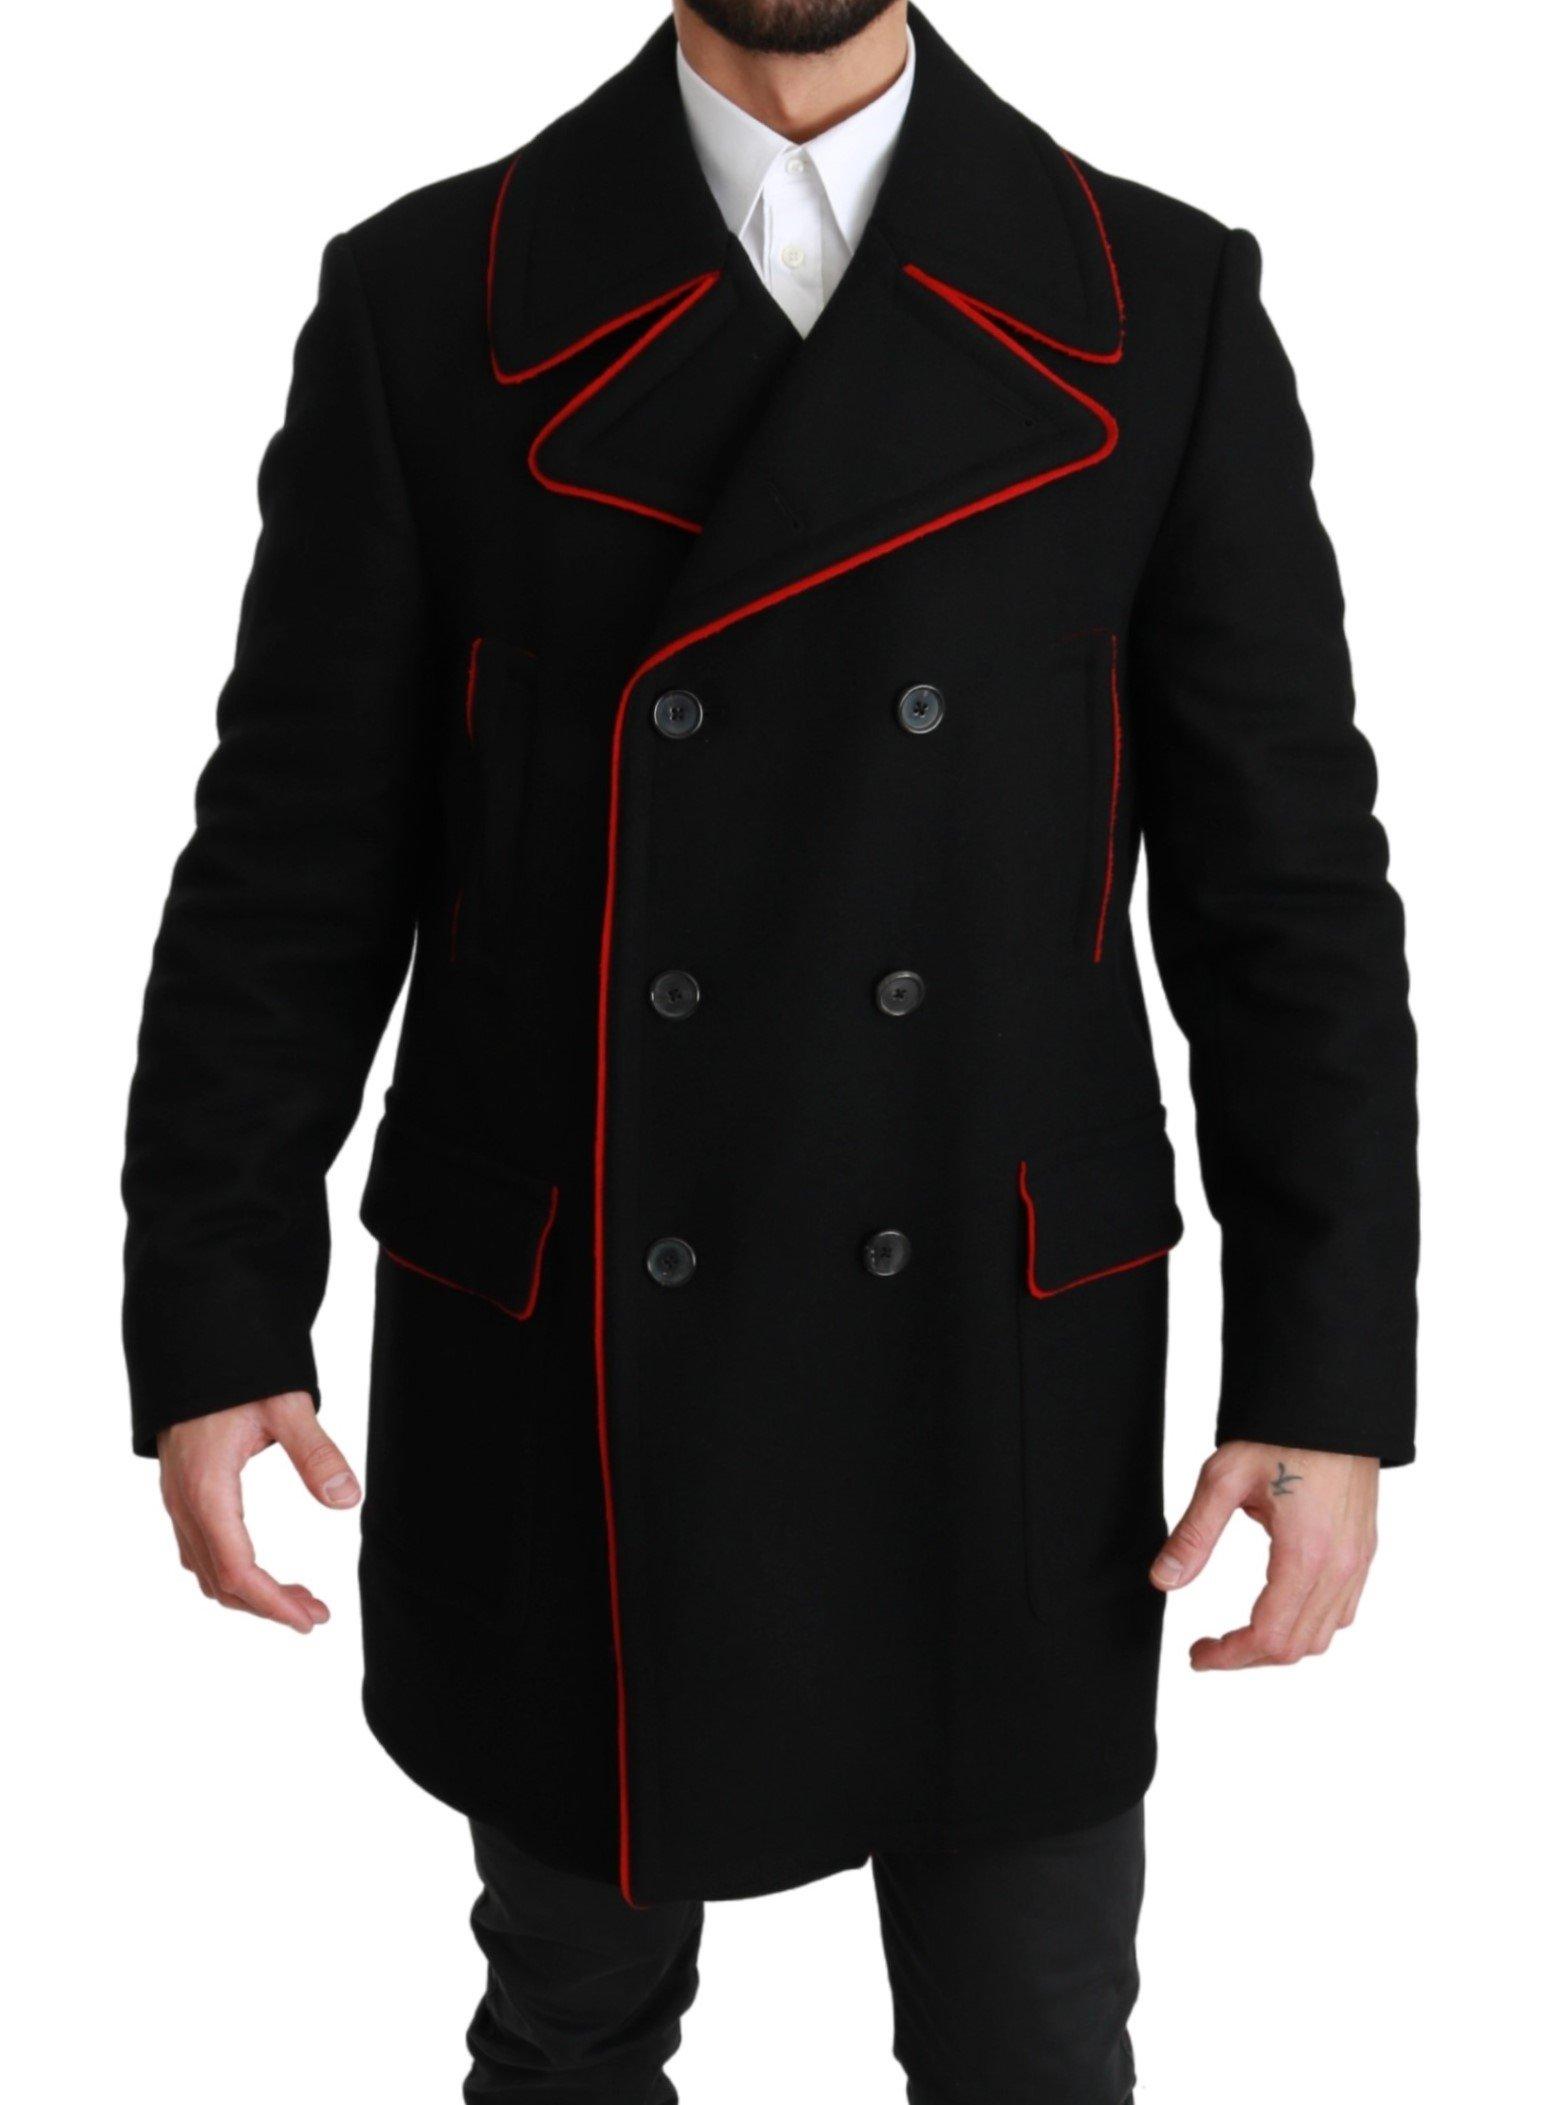 Dolce & Gabbana Men's Wool Stretch Jacket Black KOS1660 - IT50   L